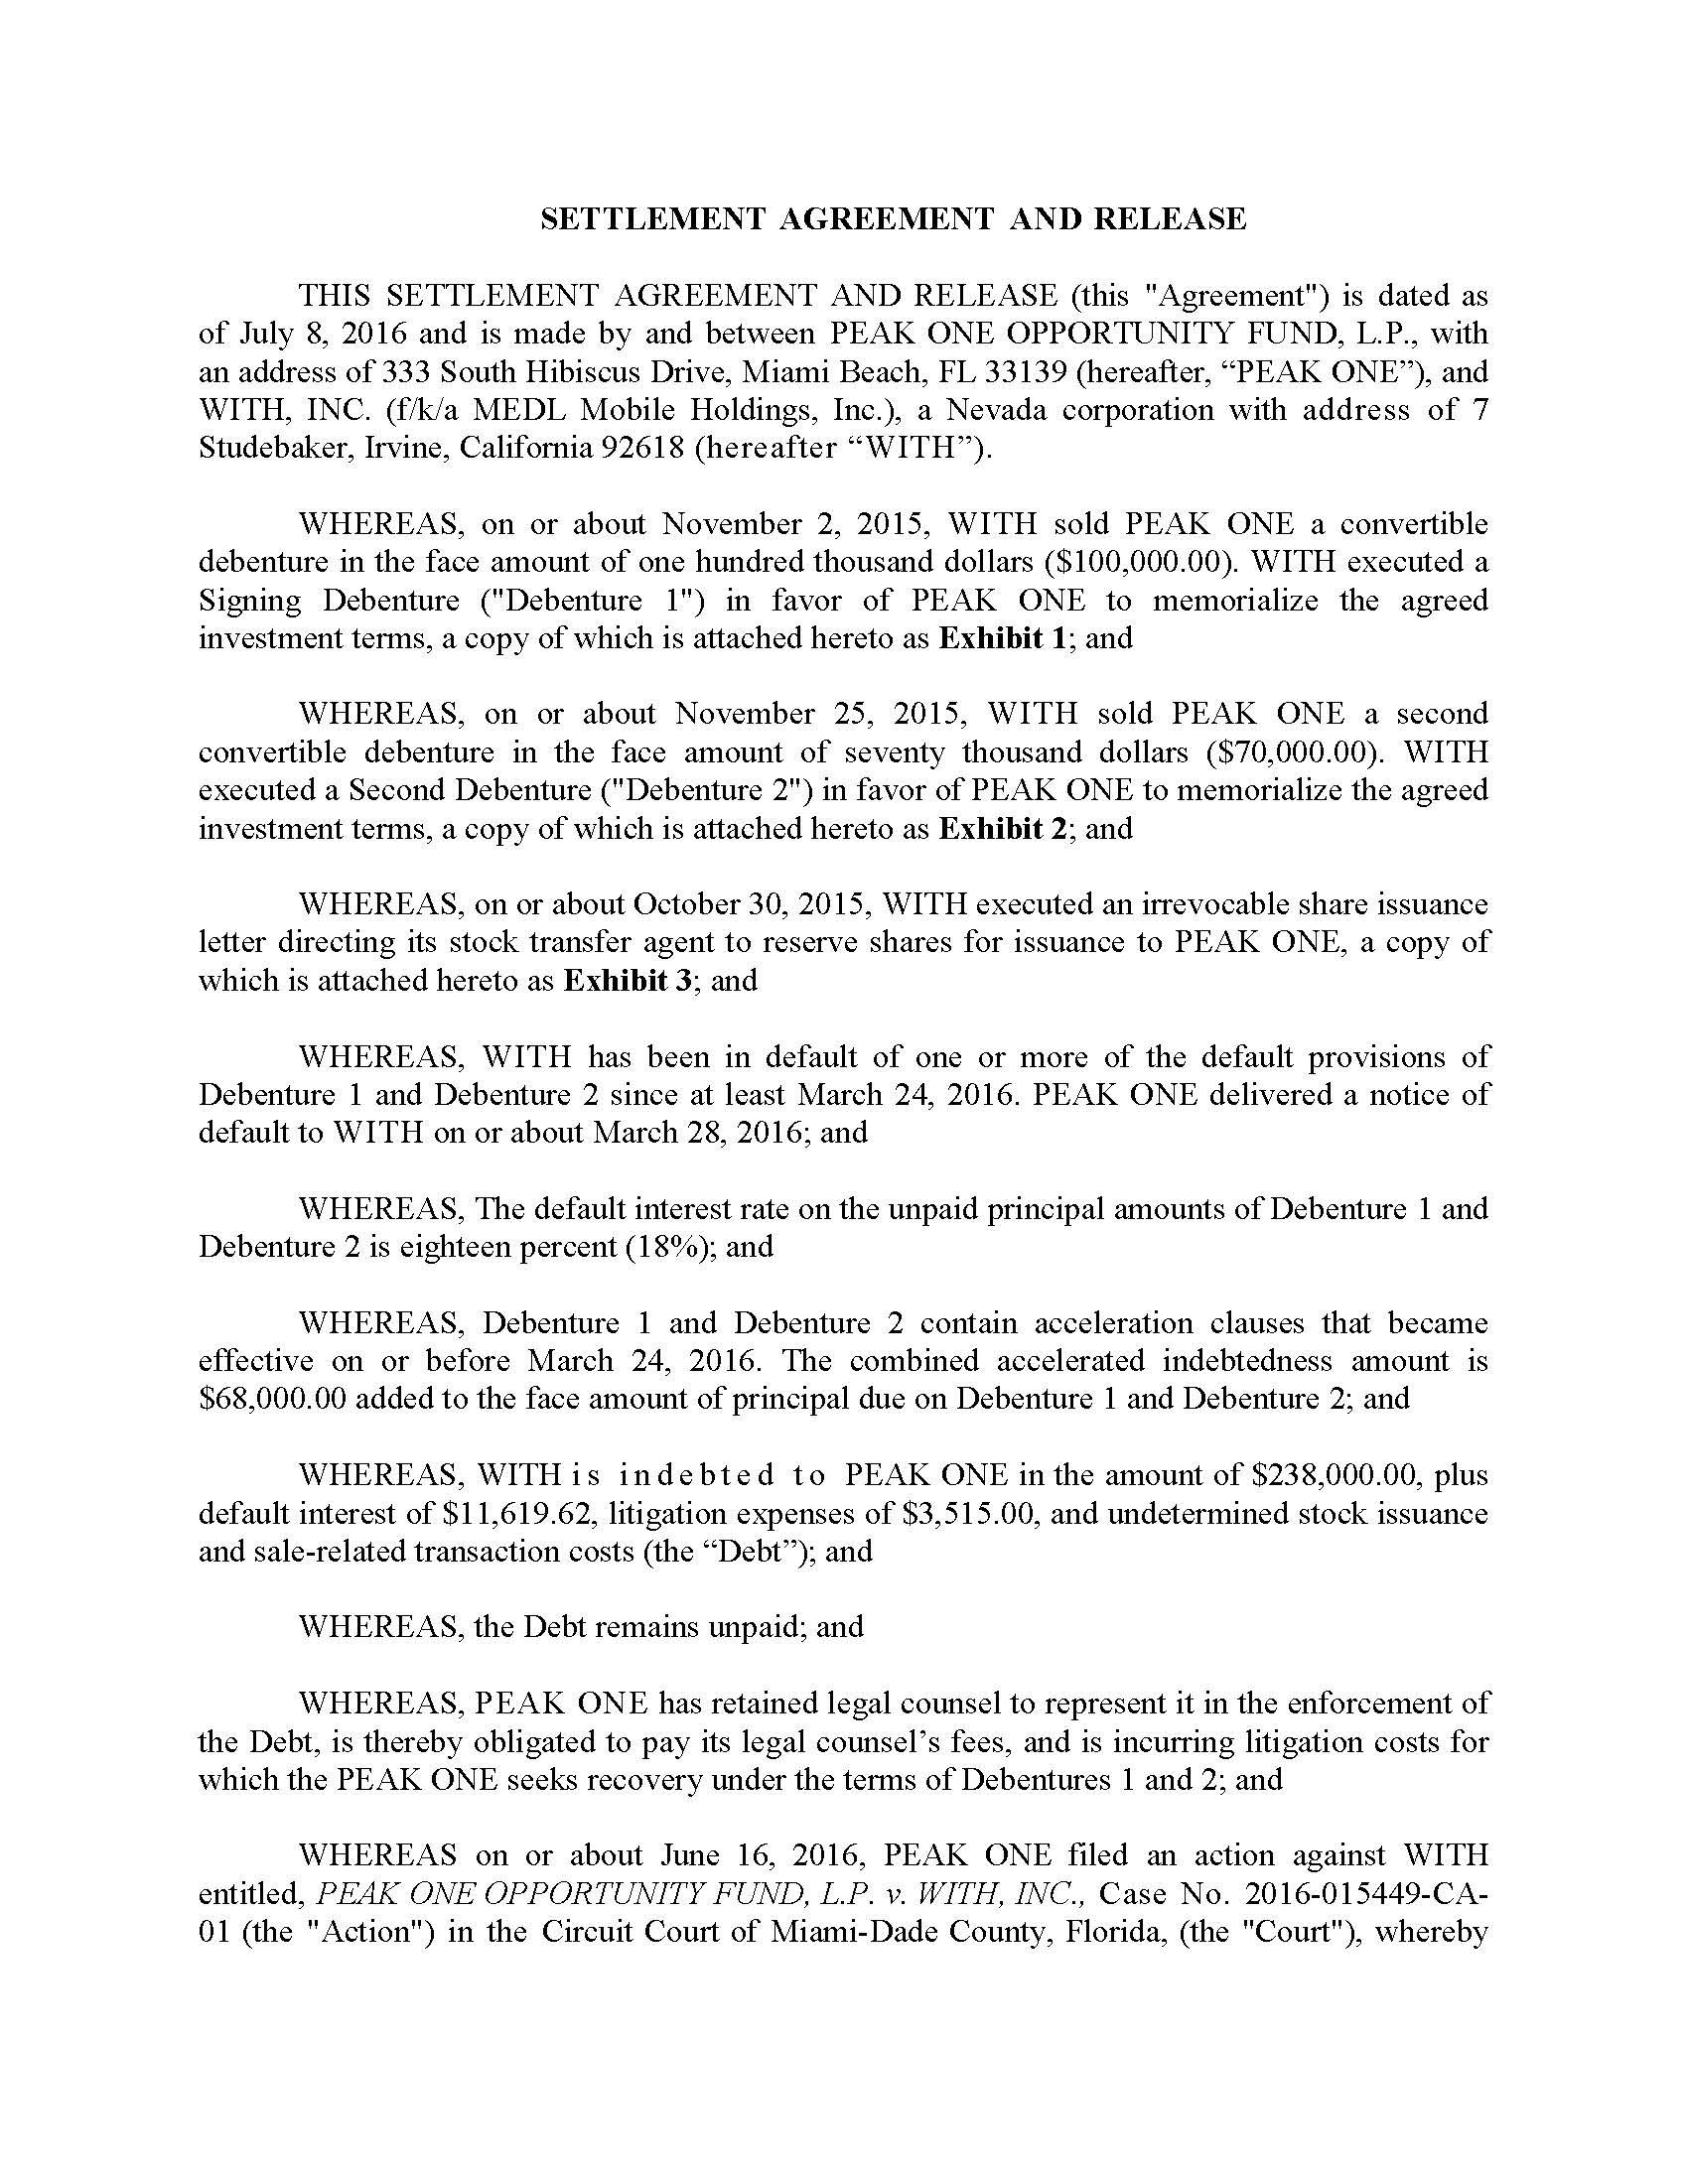 With Inc Form 8 K Ex 991 Exhibit 991 Settlement Agreement